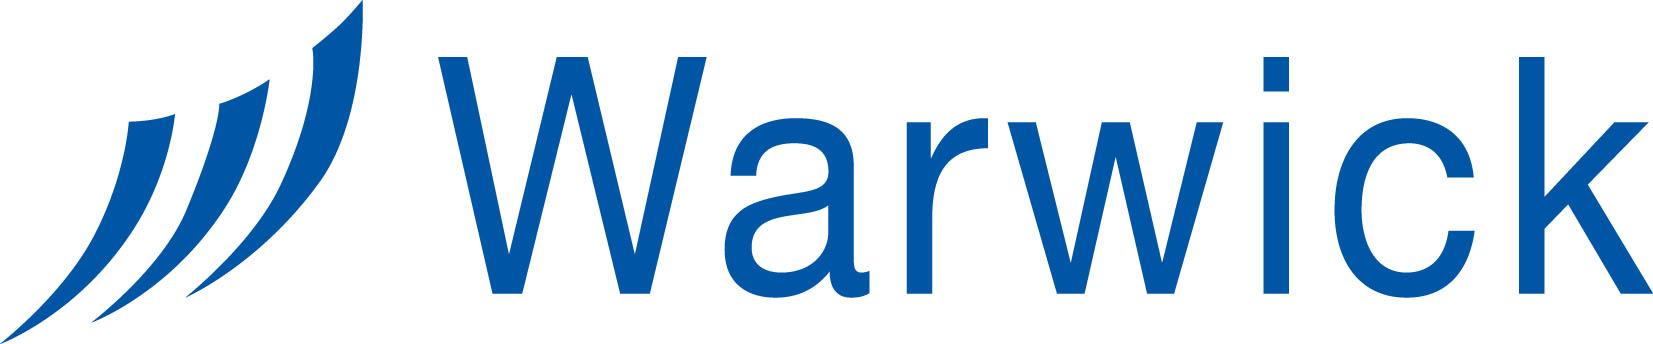 Say NO to Boring Promo! Creative Ways to Boost ROI | Warwick